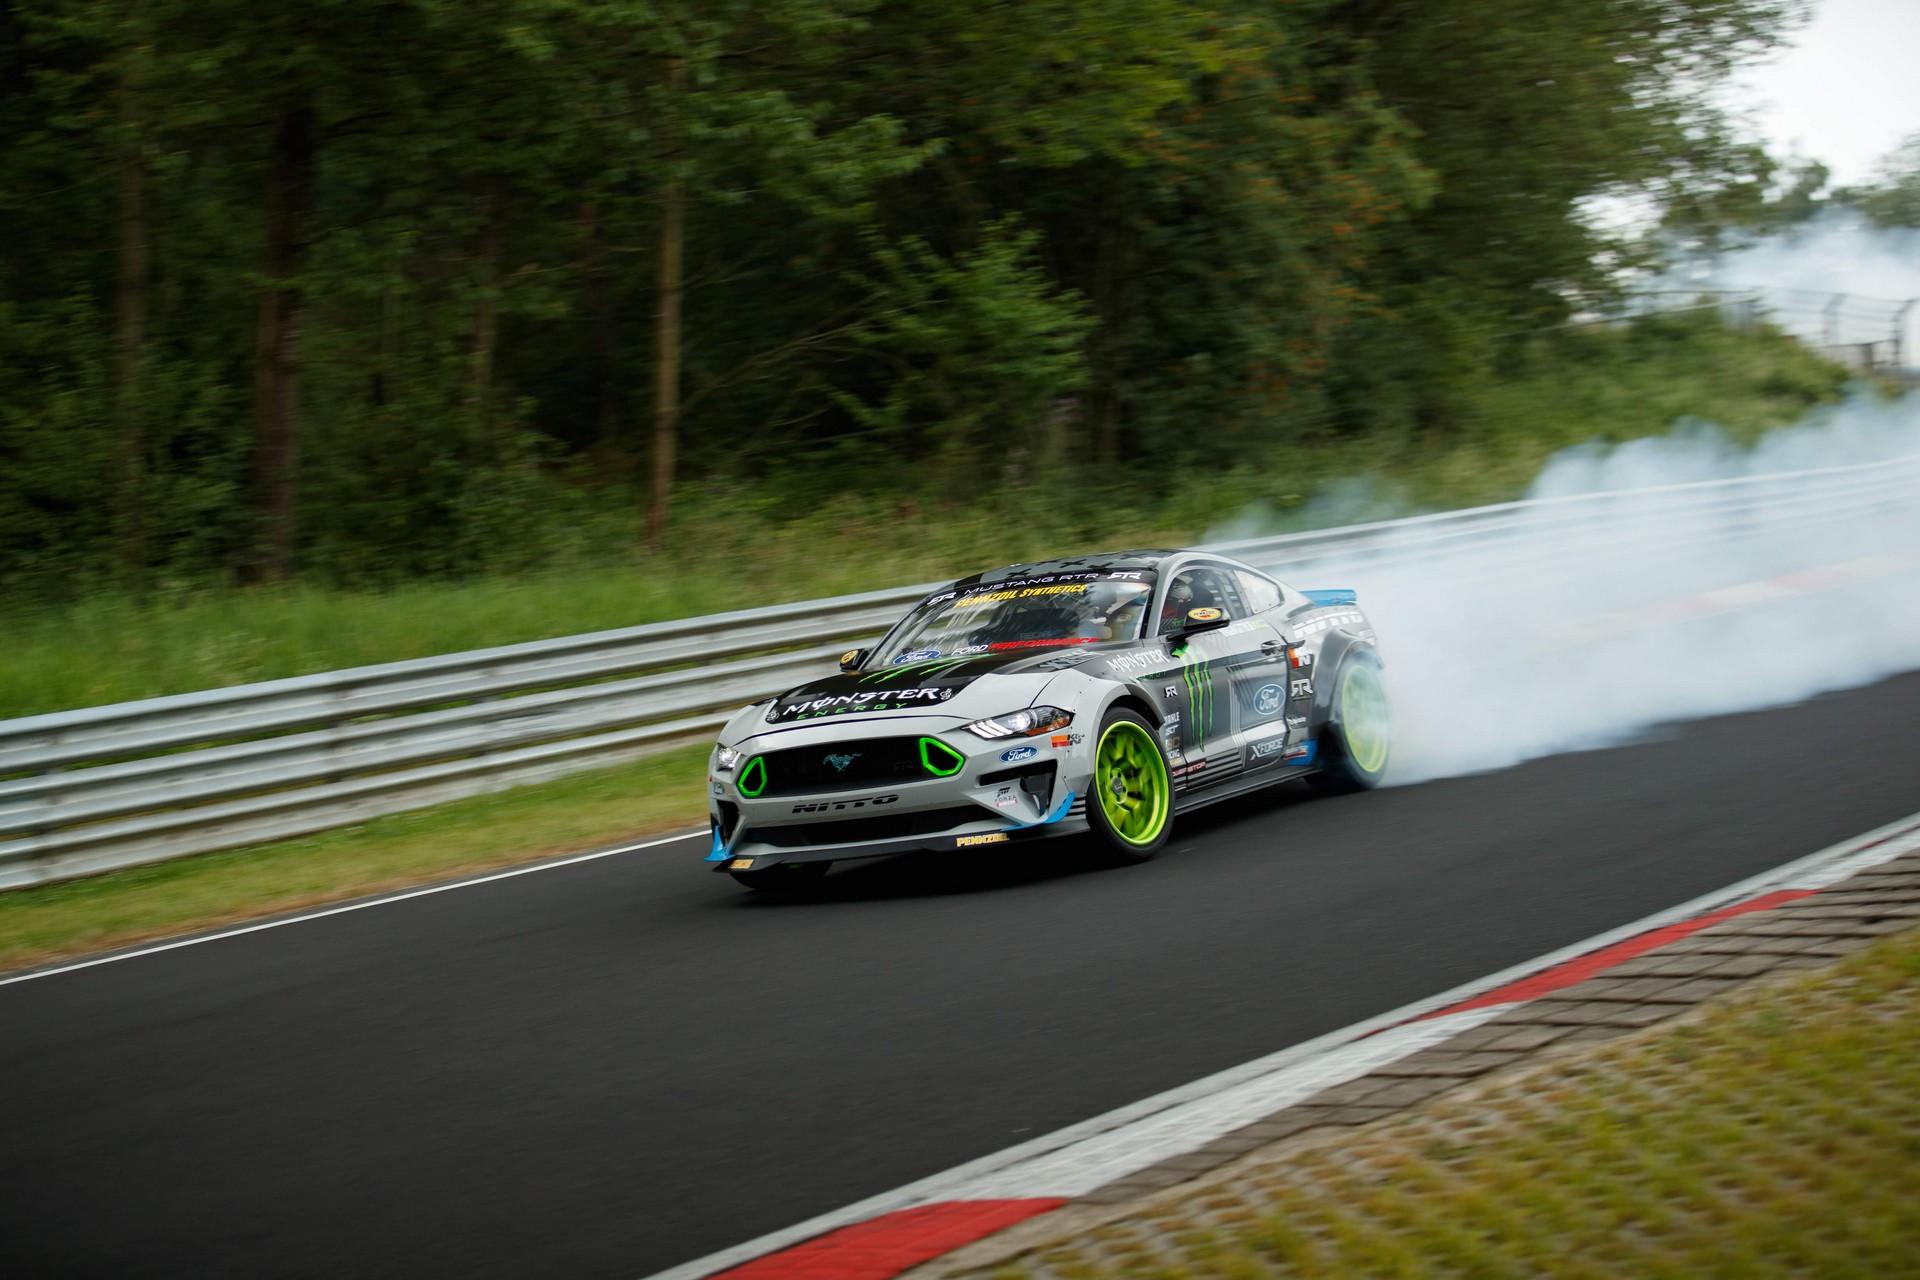 Ford_Mustang_RTR_Nurburgring_0004